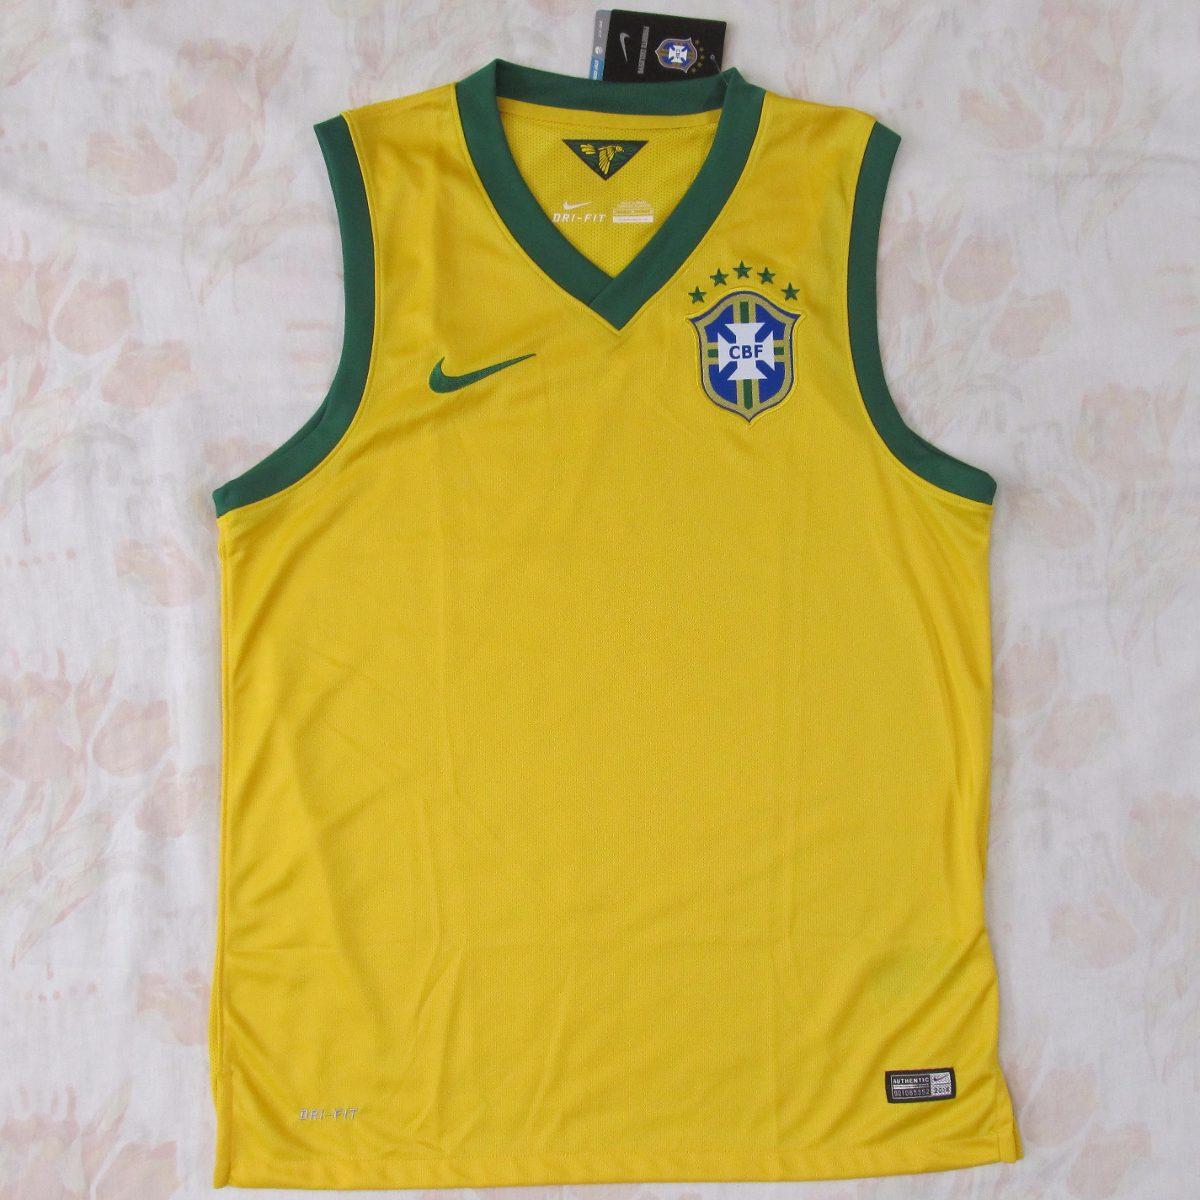 cd8a2b691b979 camisa regata brasil cbf nike home 2014 m original fn1608. Carregando zoom.